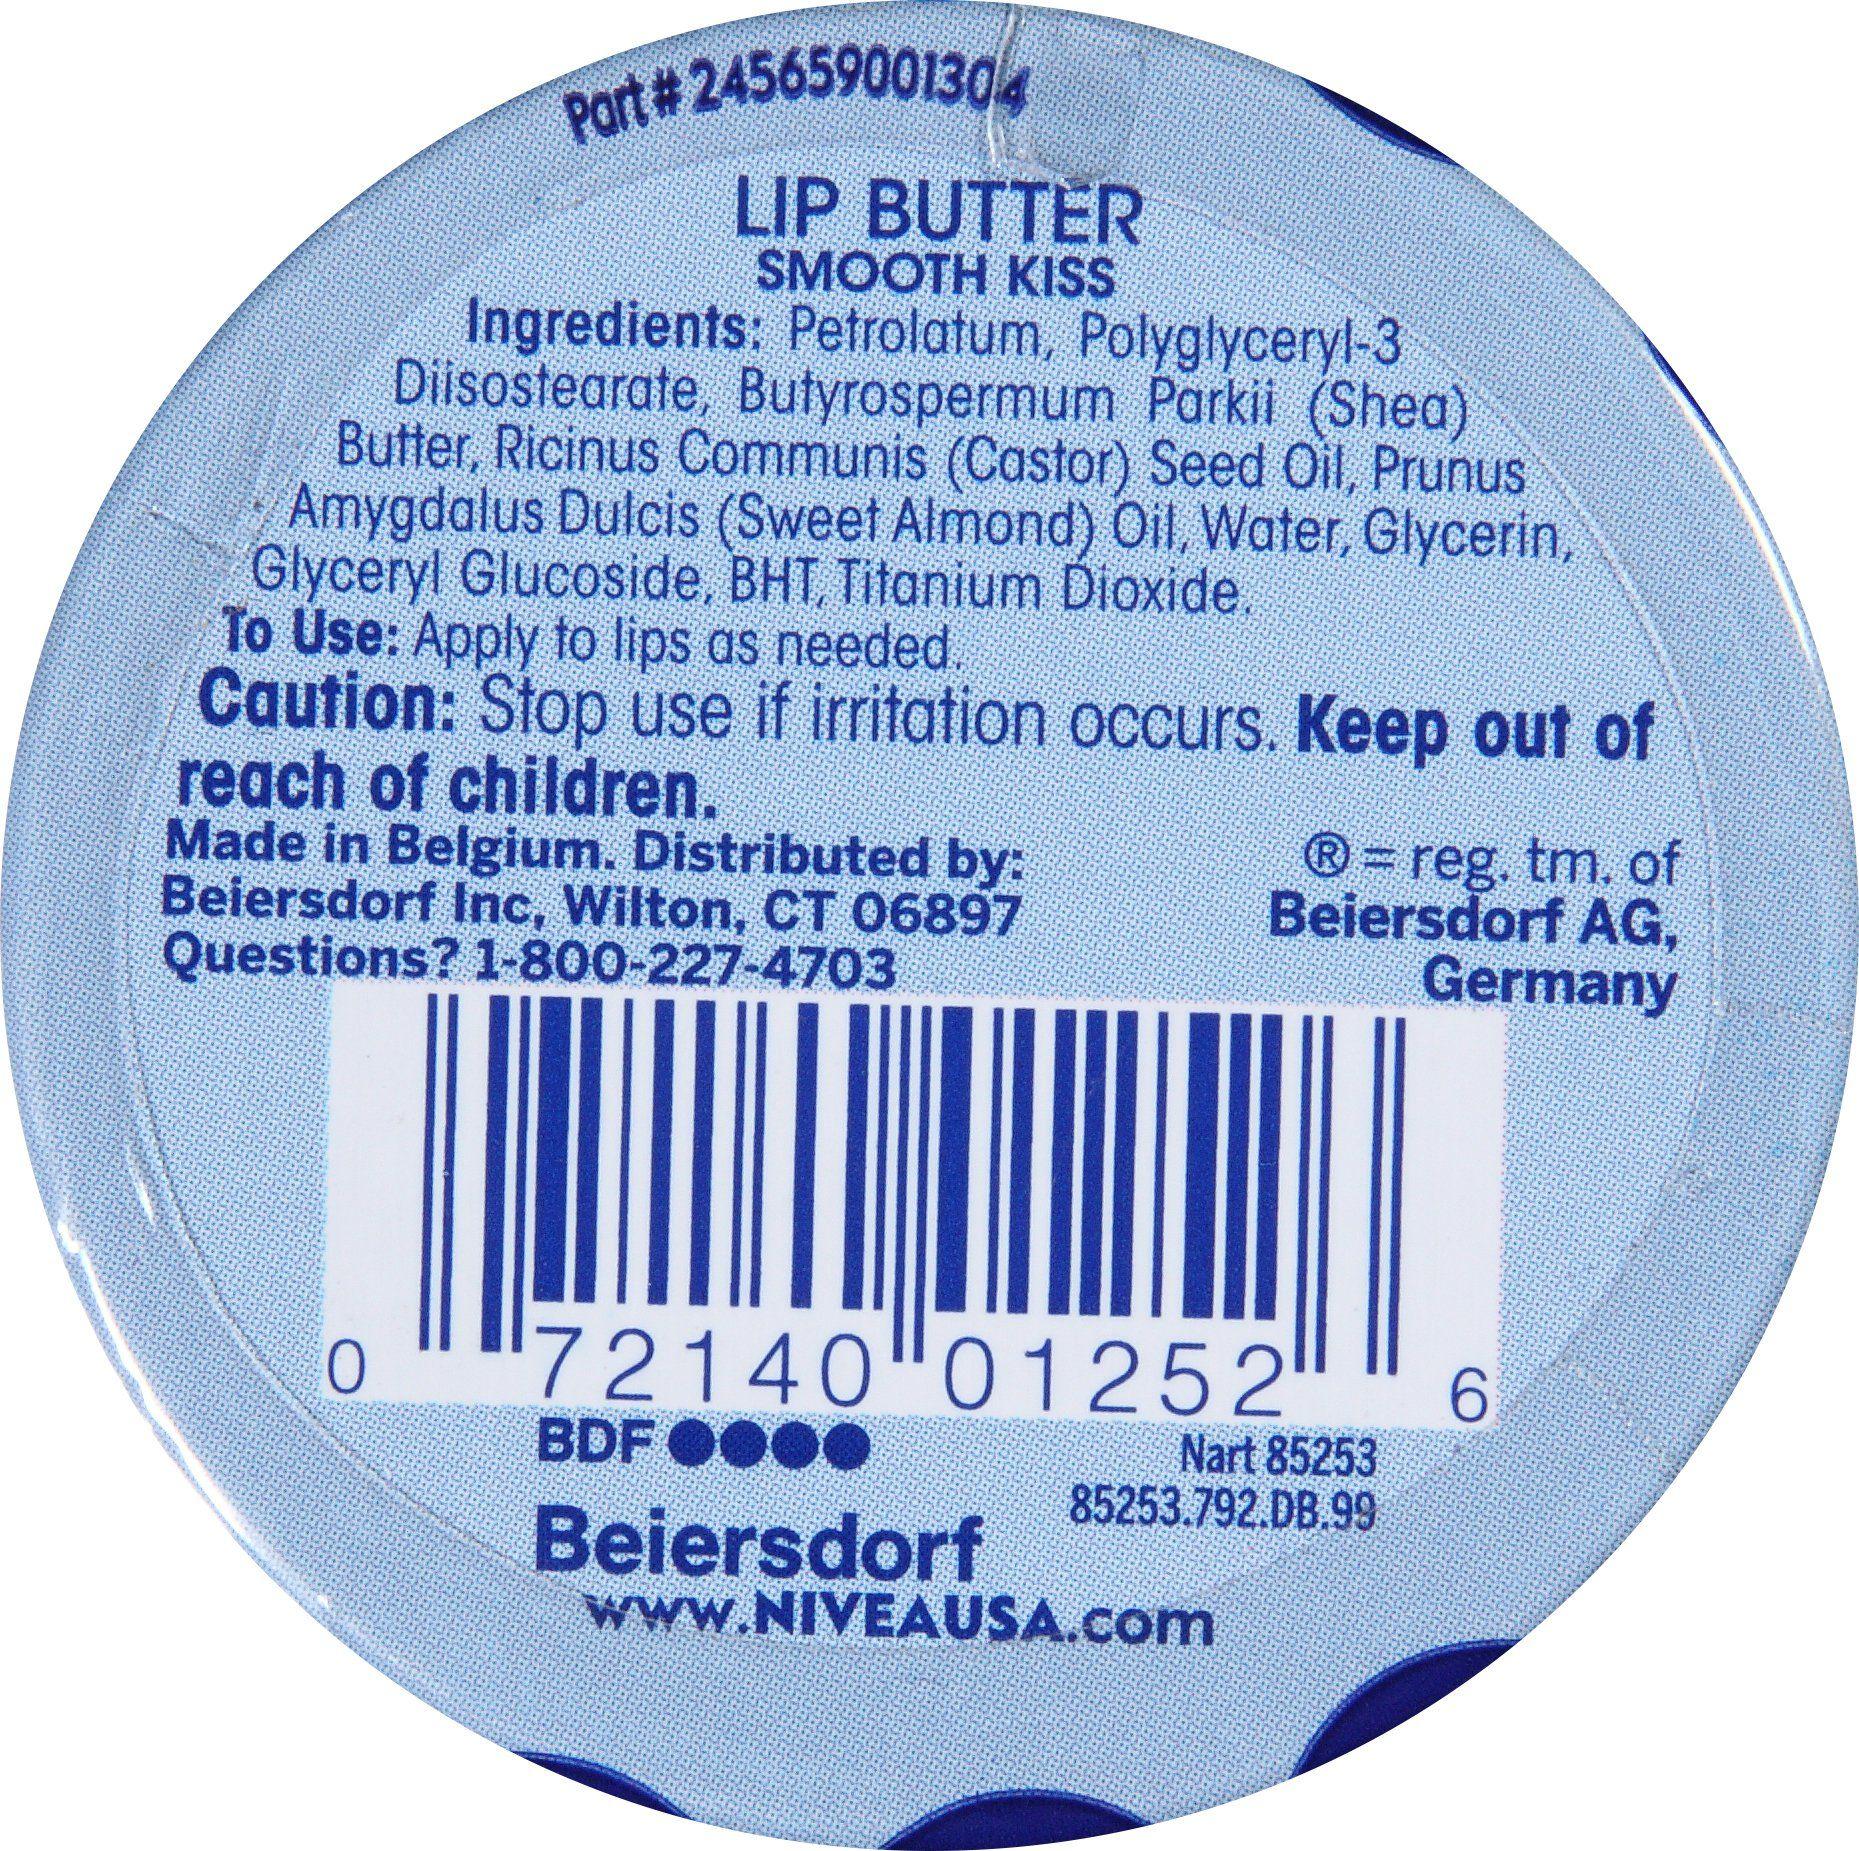 Nivea lip butter loose tin smooth kiss 059 ounce want